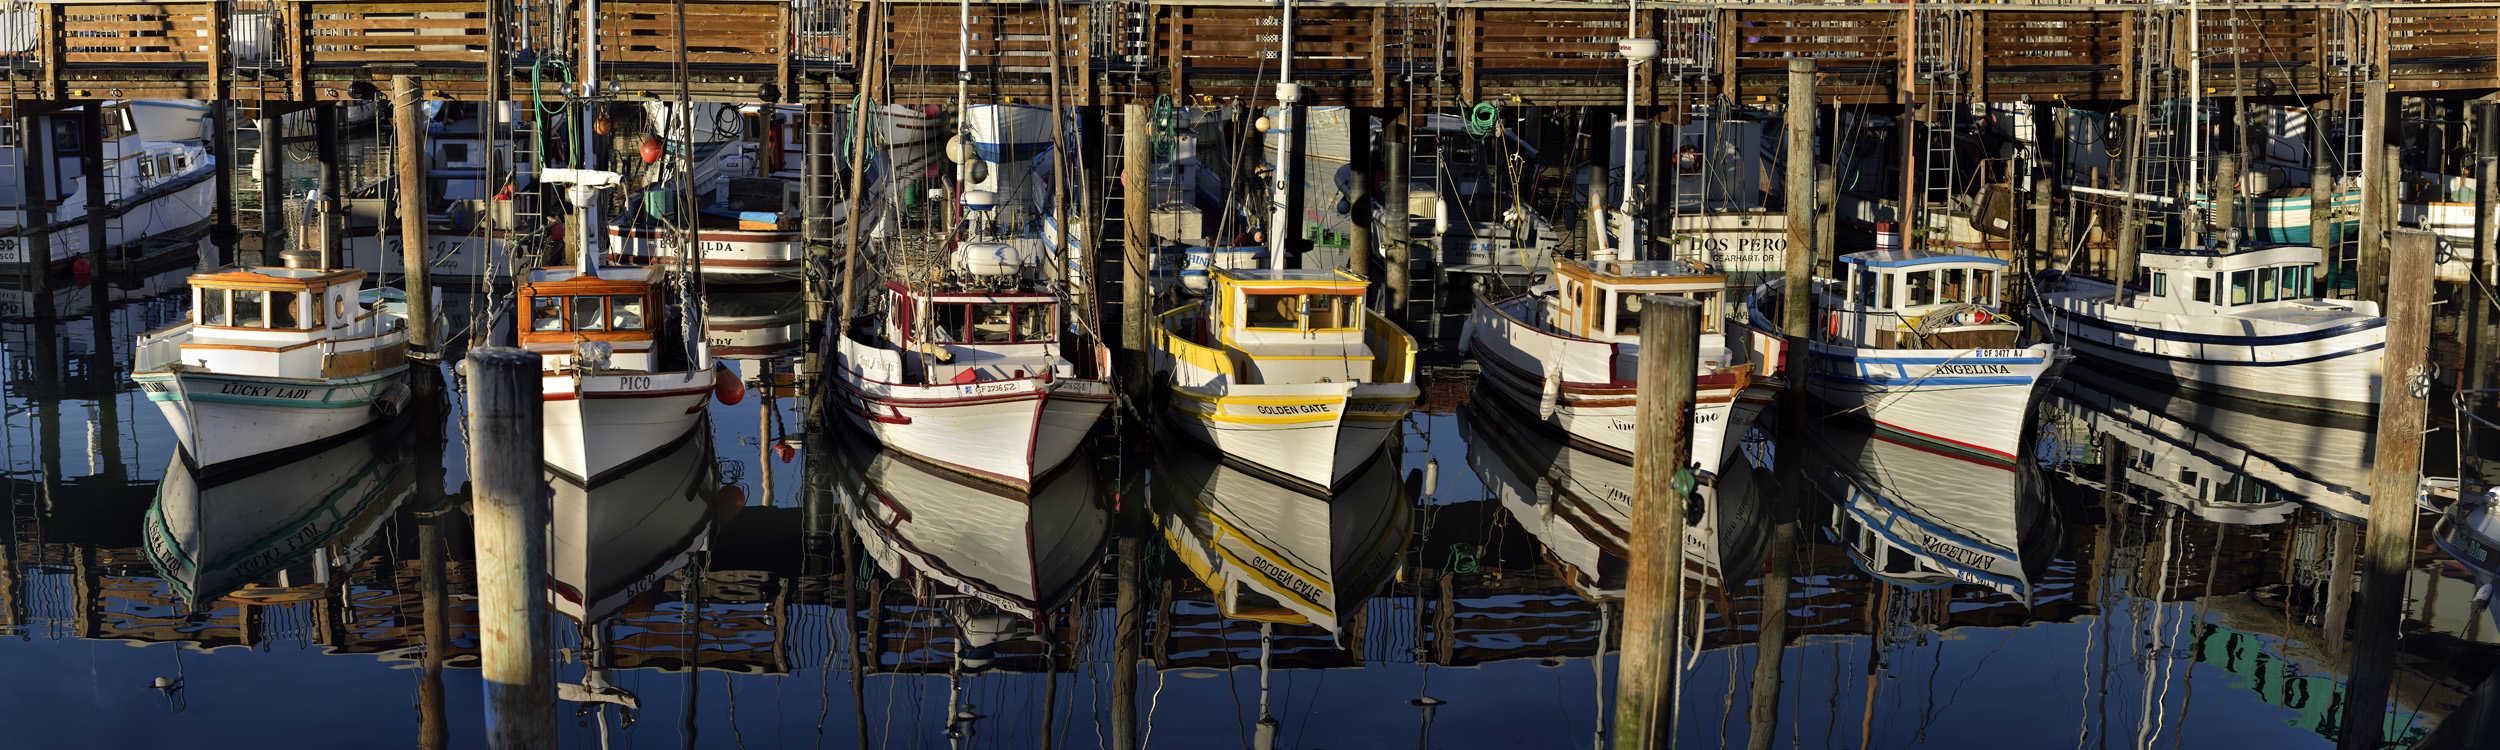 small Vessels at Fisherman's wharf 2